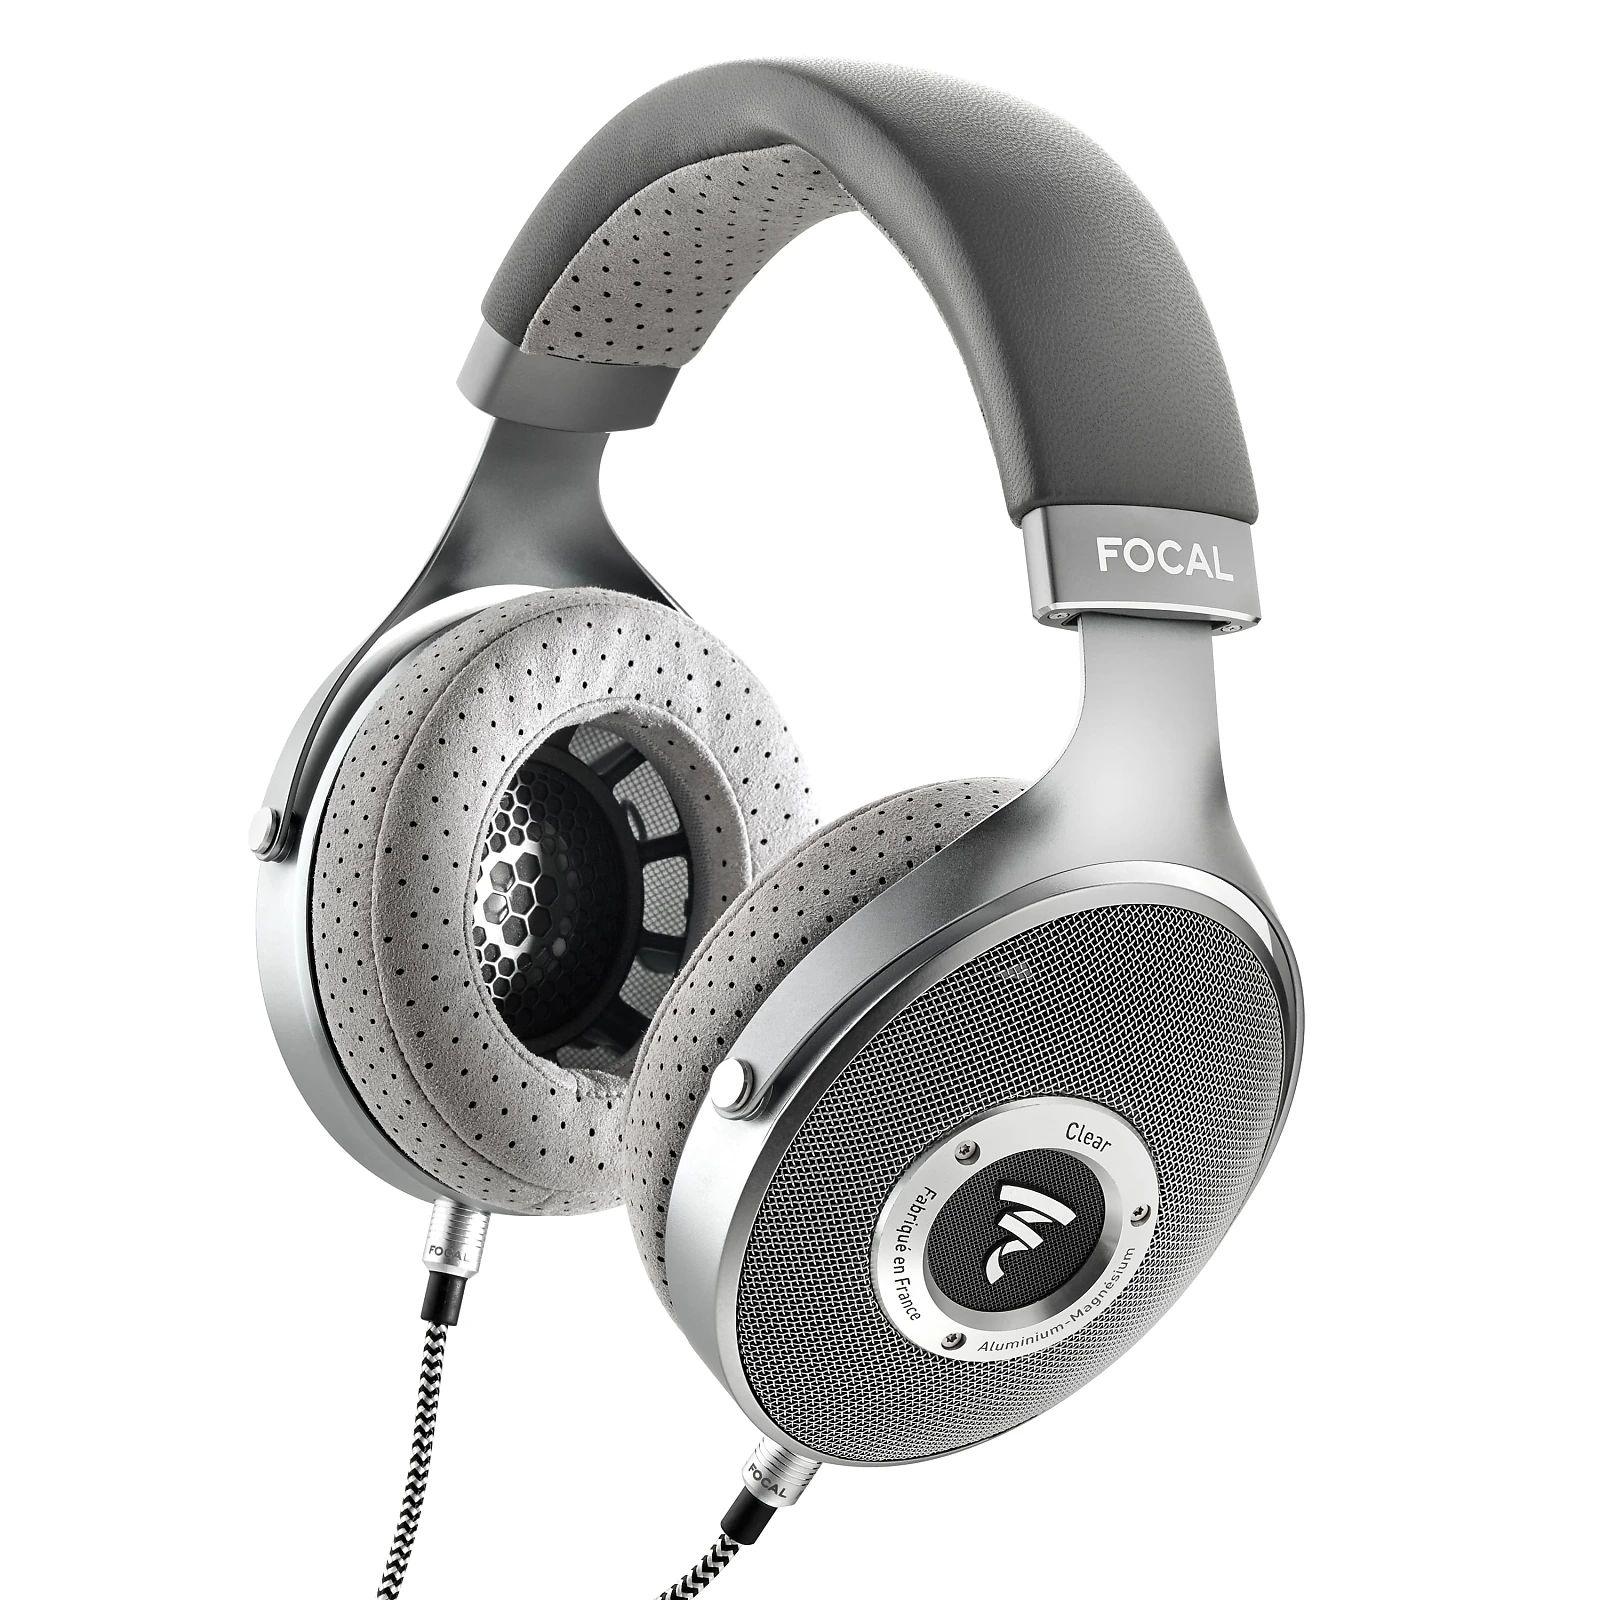 Focal Clear - Offener High-End Kopfhörer (Made in France, 40mm Membran, 55Ω, 5Hz - 28kHz, 104dB bei 1mW)